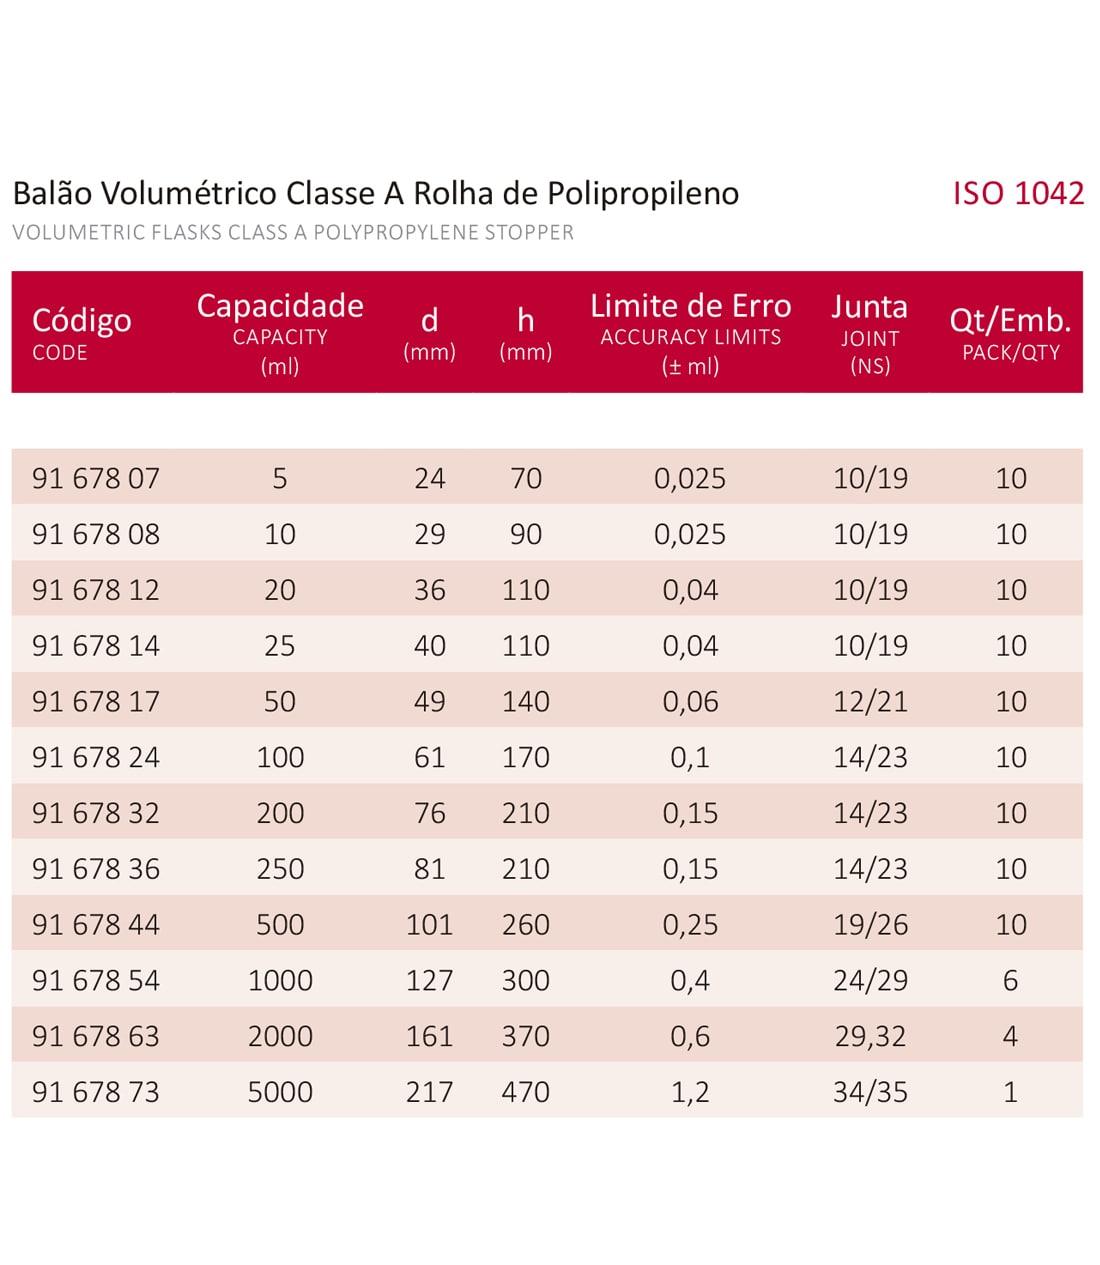 BALÃO VOLUMÉTRICO CLASSE A ROLHA POLI C/ CERTIFICADO RBC 6000 ML - Marca Laborglas - Cód. 9167876-R